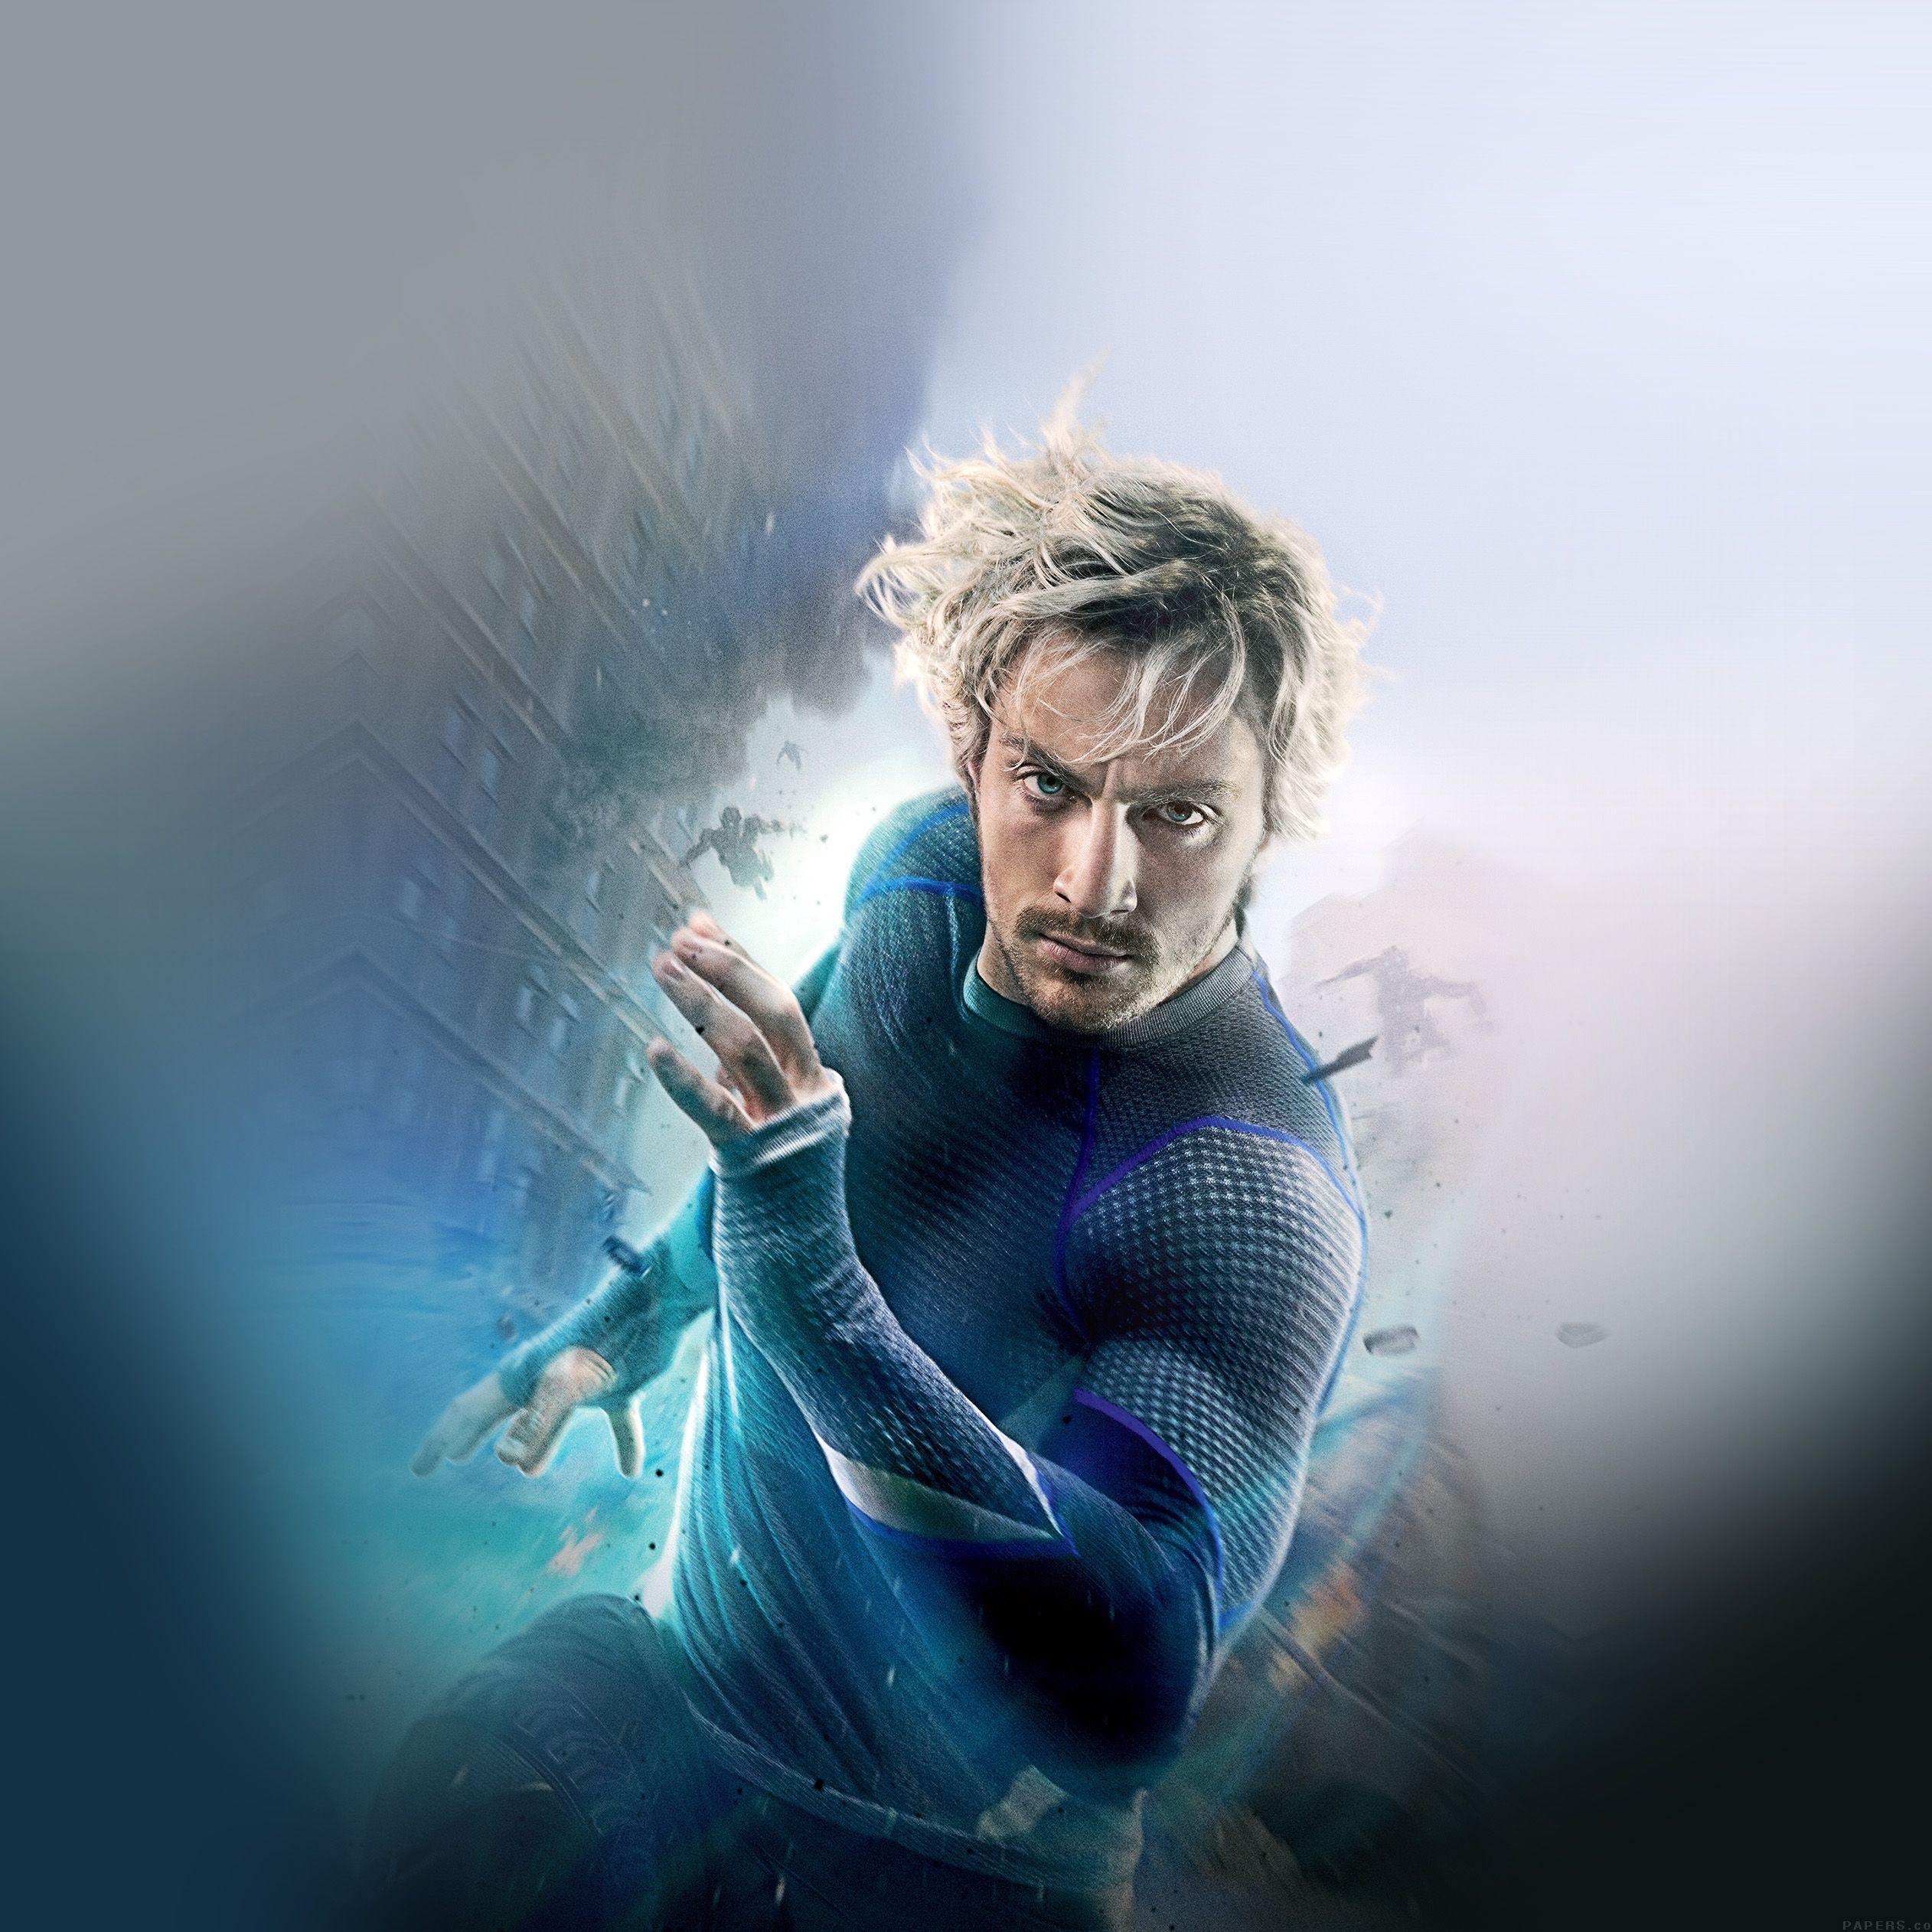 Avengers wallpapers for iPhone, iPad and desktop Aaron